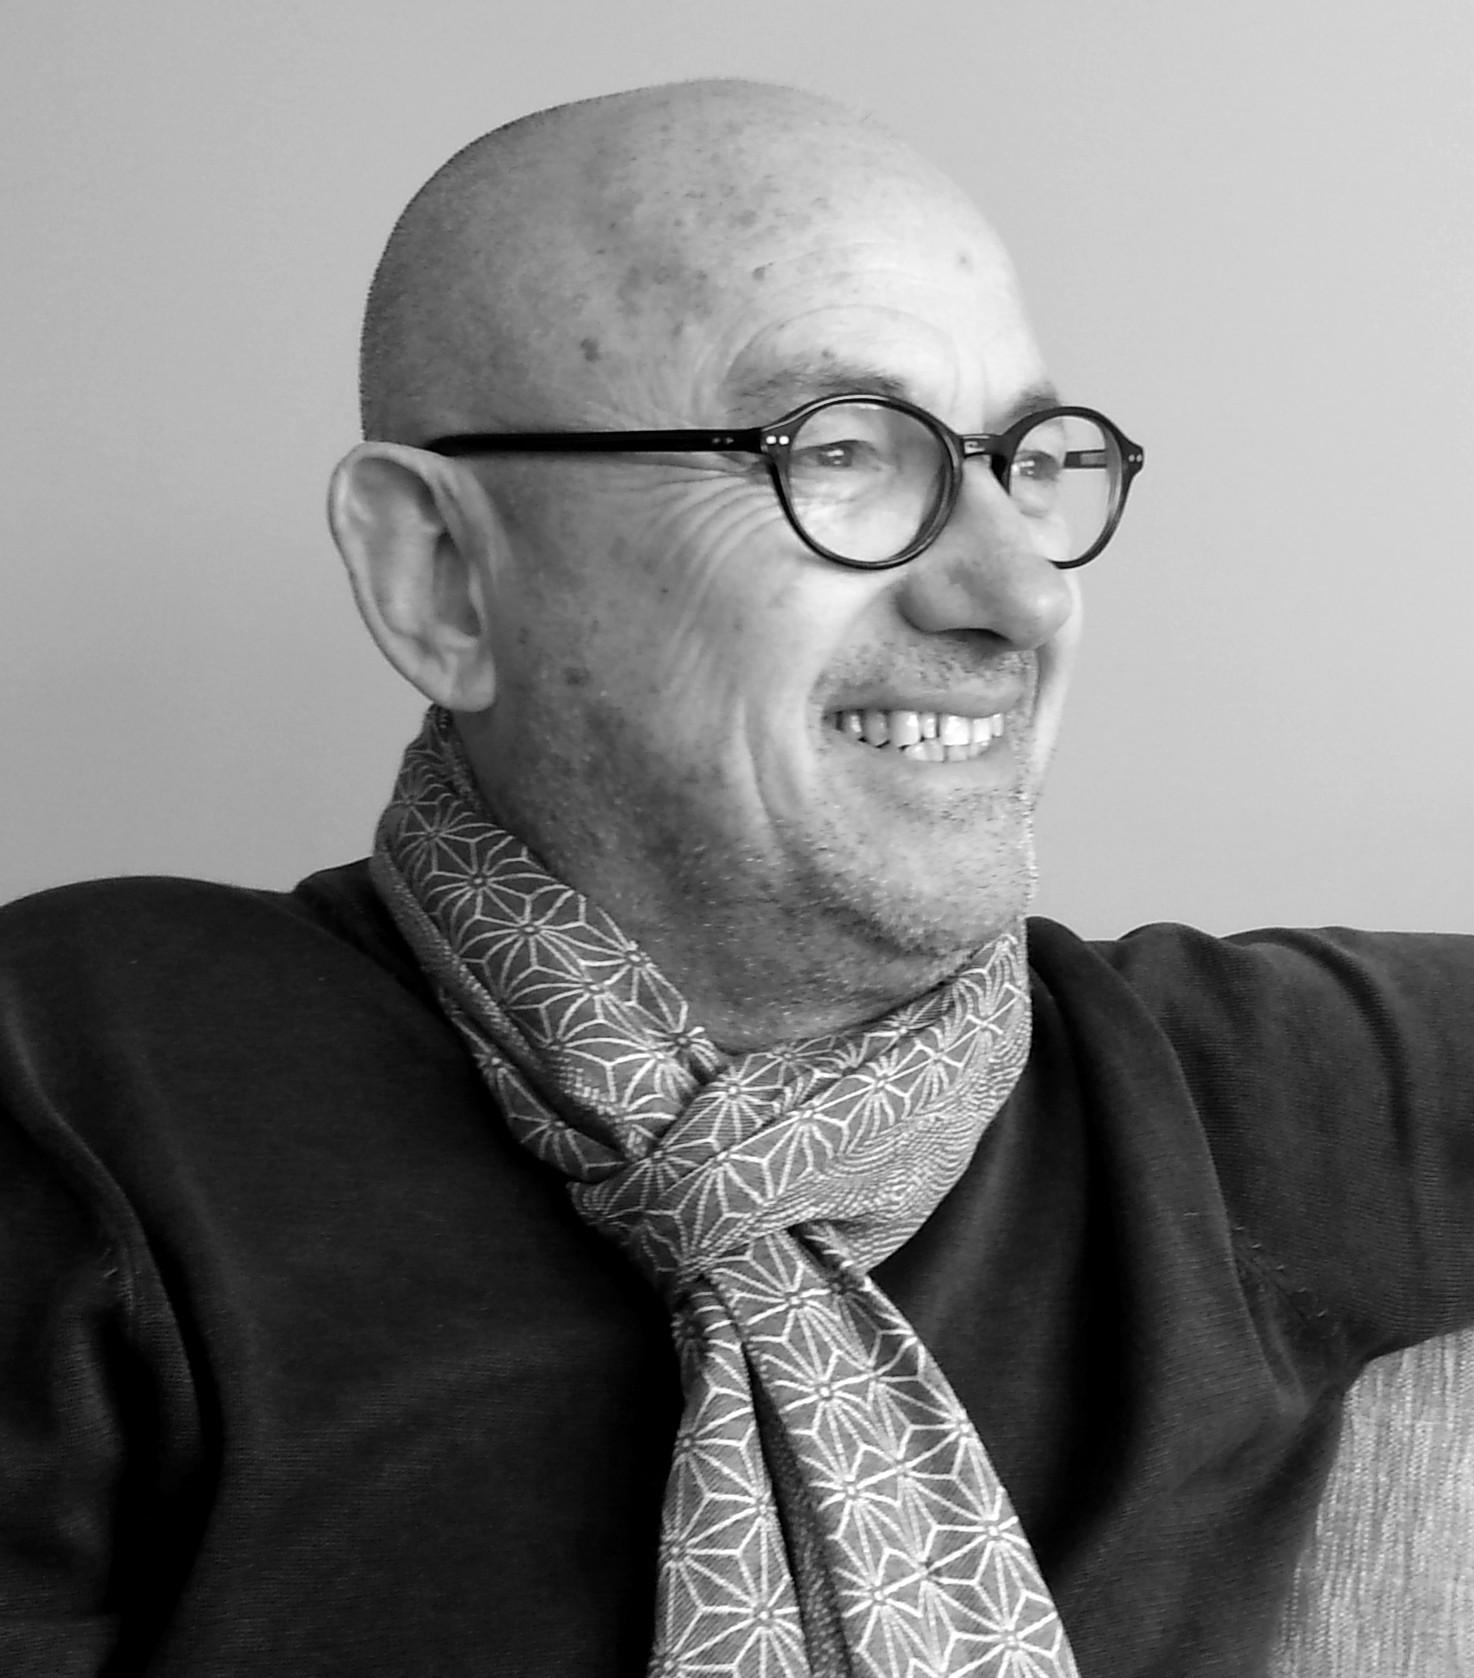 Bernard Halil